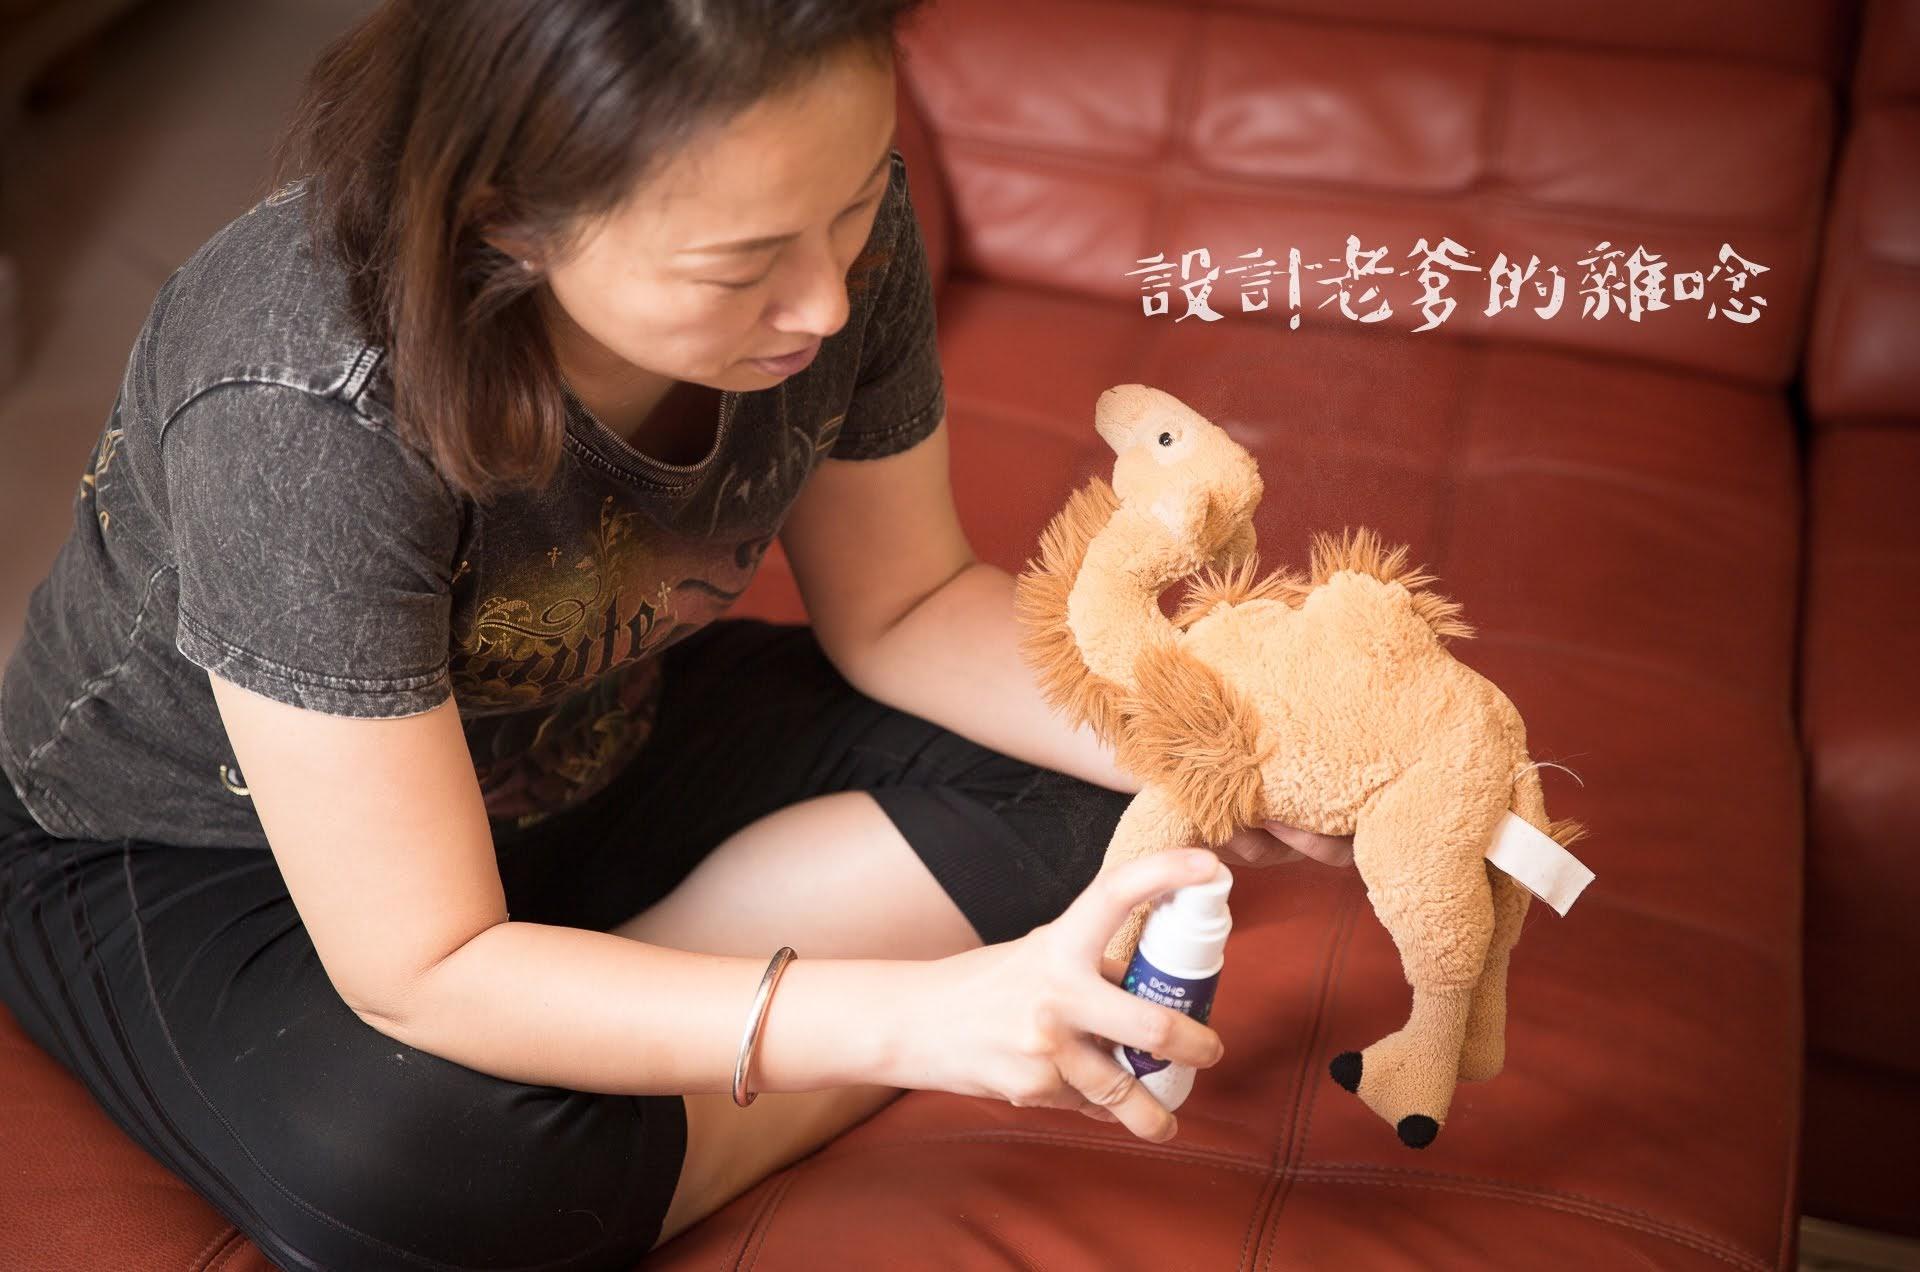 DOHO寶貝噴肌膚護理噴霧、抗菌噴霧...簡單的噴噴噴就可以為你的寶貝提供棒棒的防護呢!